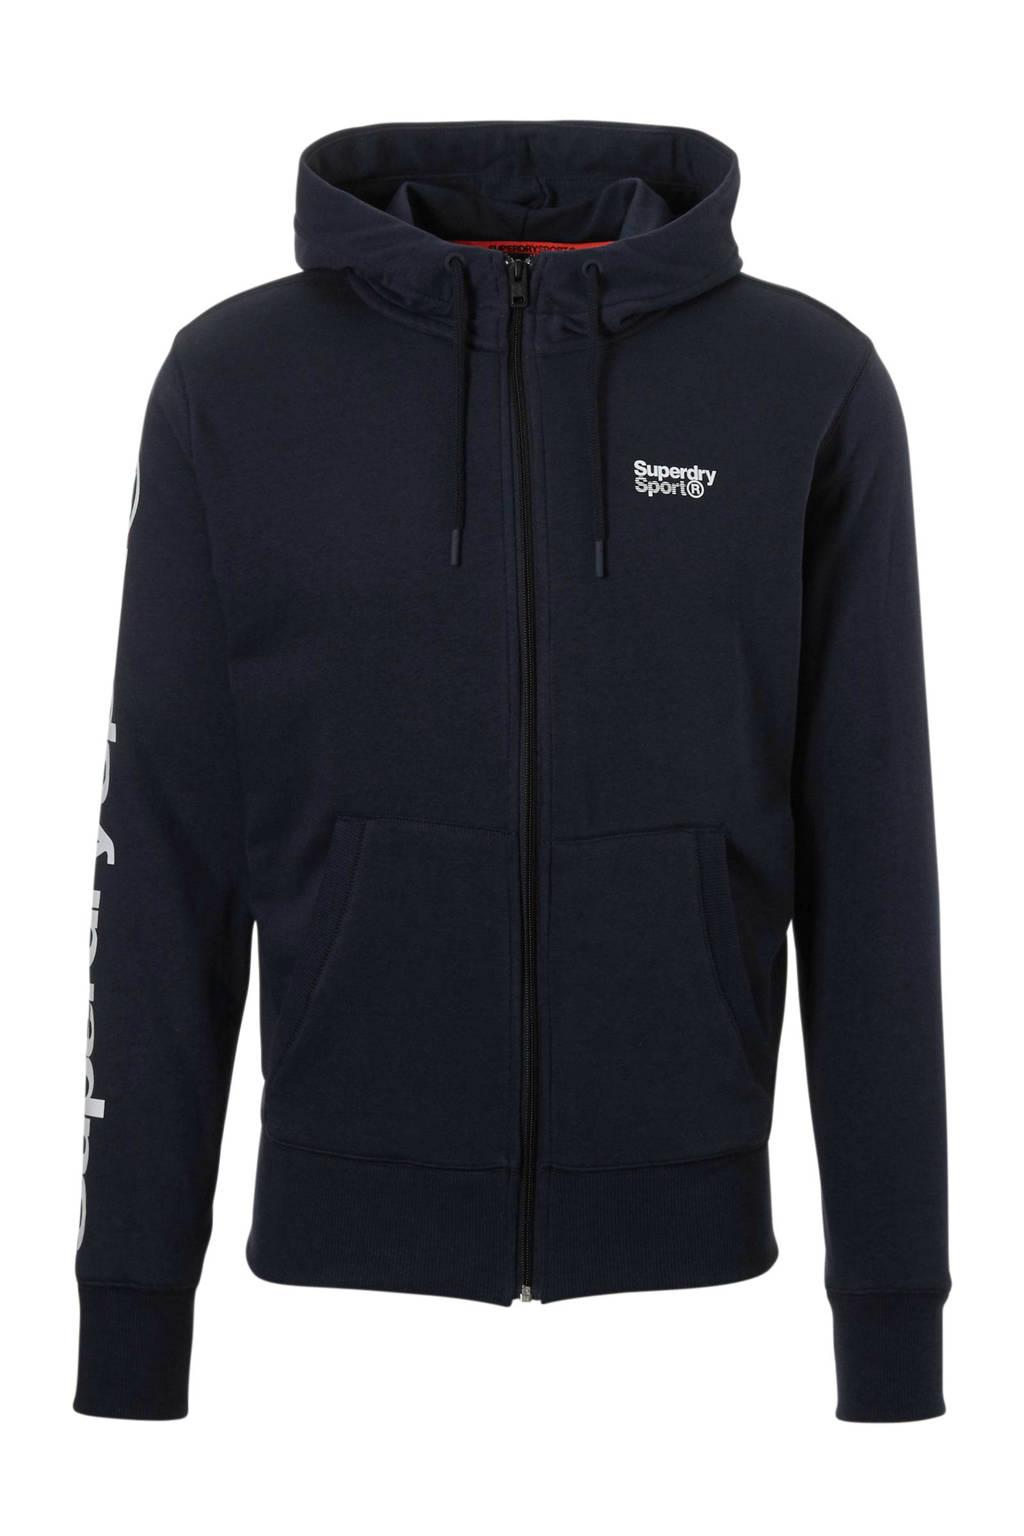 Superdry Sport   sportsweater donkerblauw, Donkerblauw